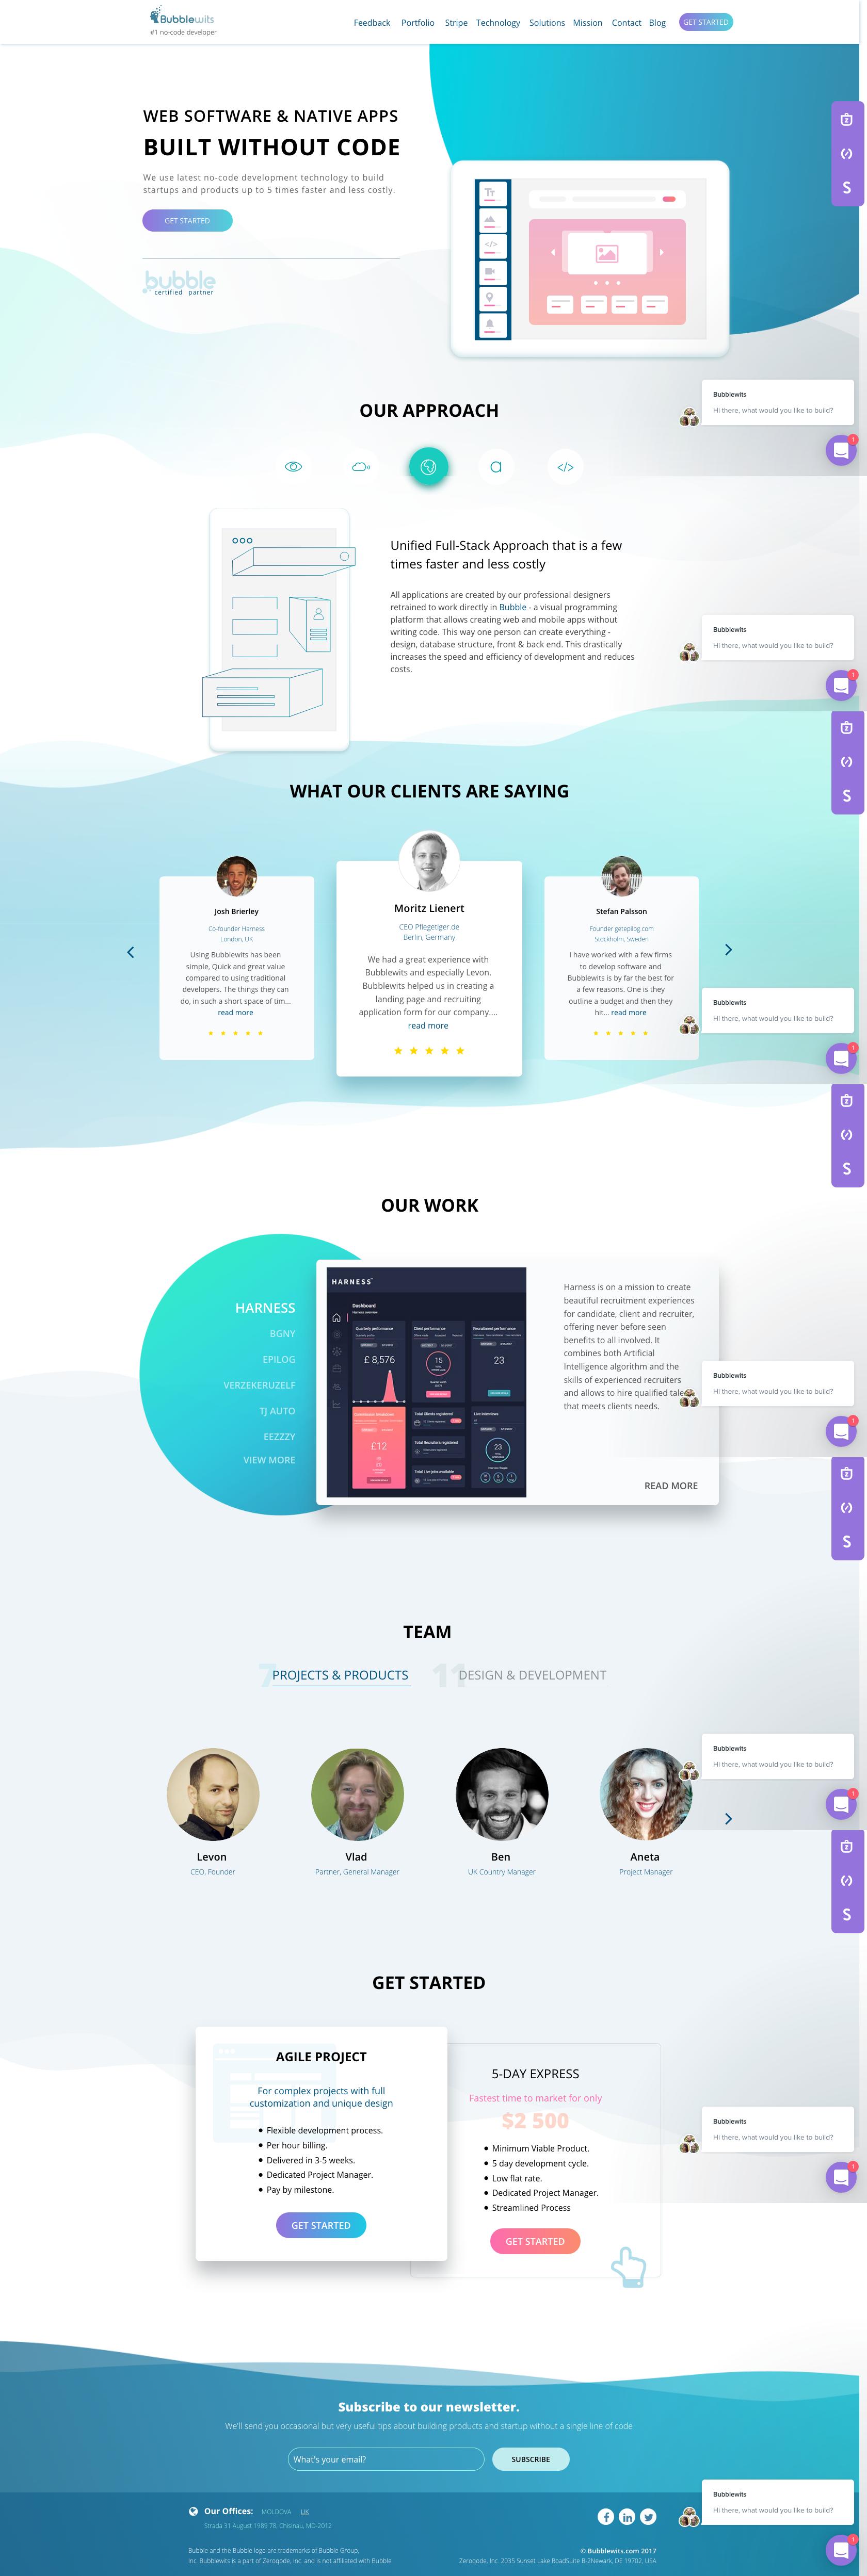 Pin By Minlovecat On Web Design Web Design Infographic Web Design Web Template Design